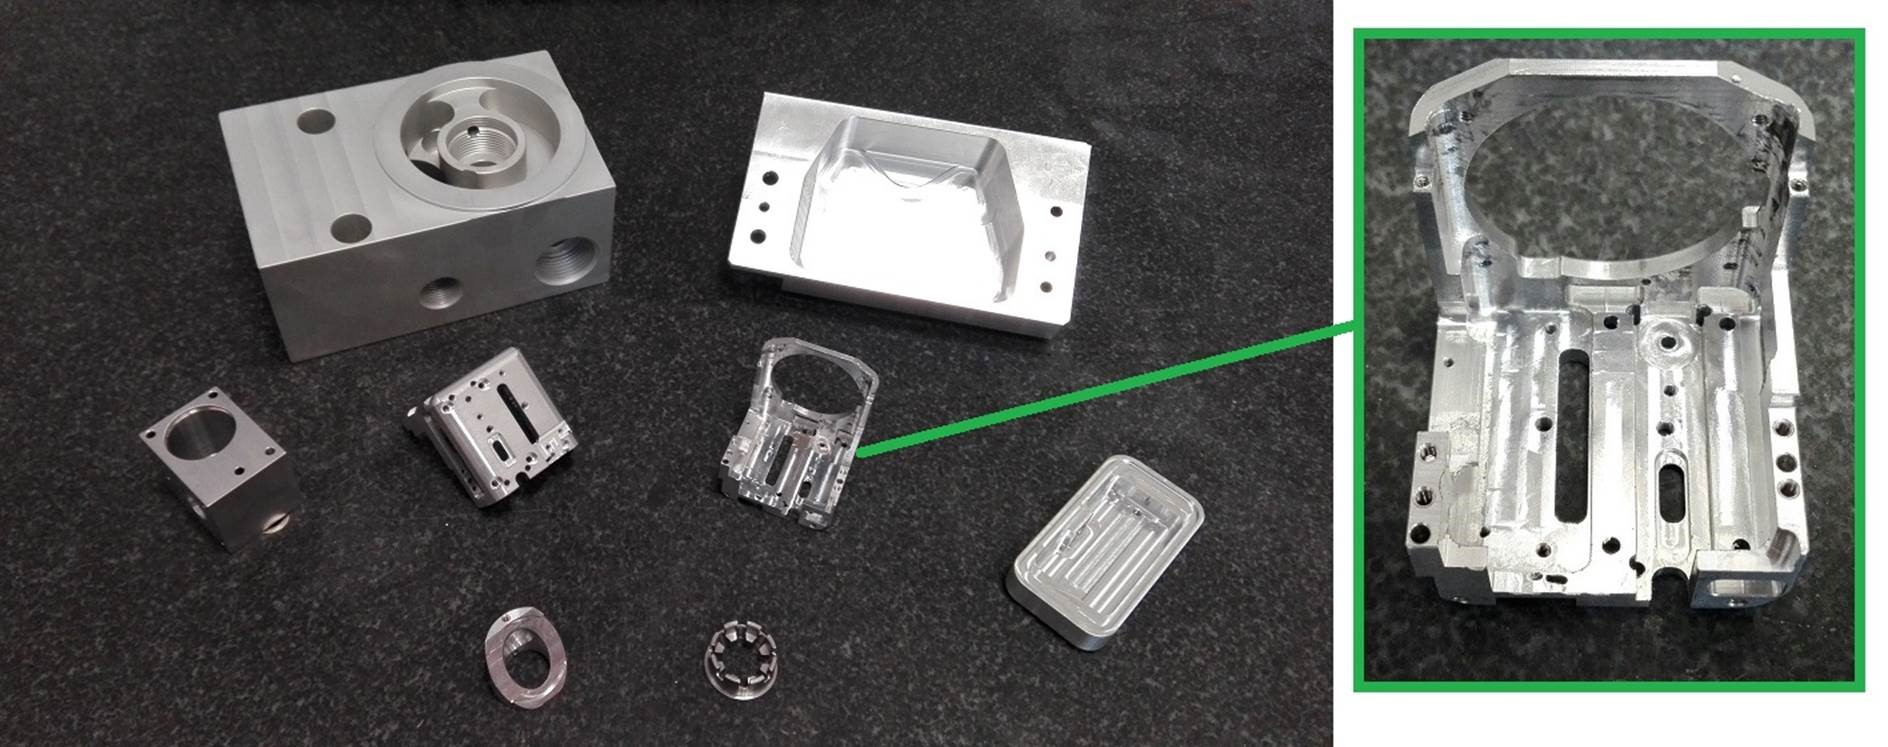 Milltech - componenti micromeccanici e meccanici